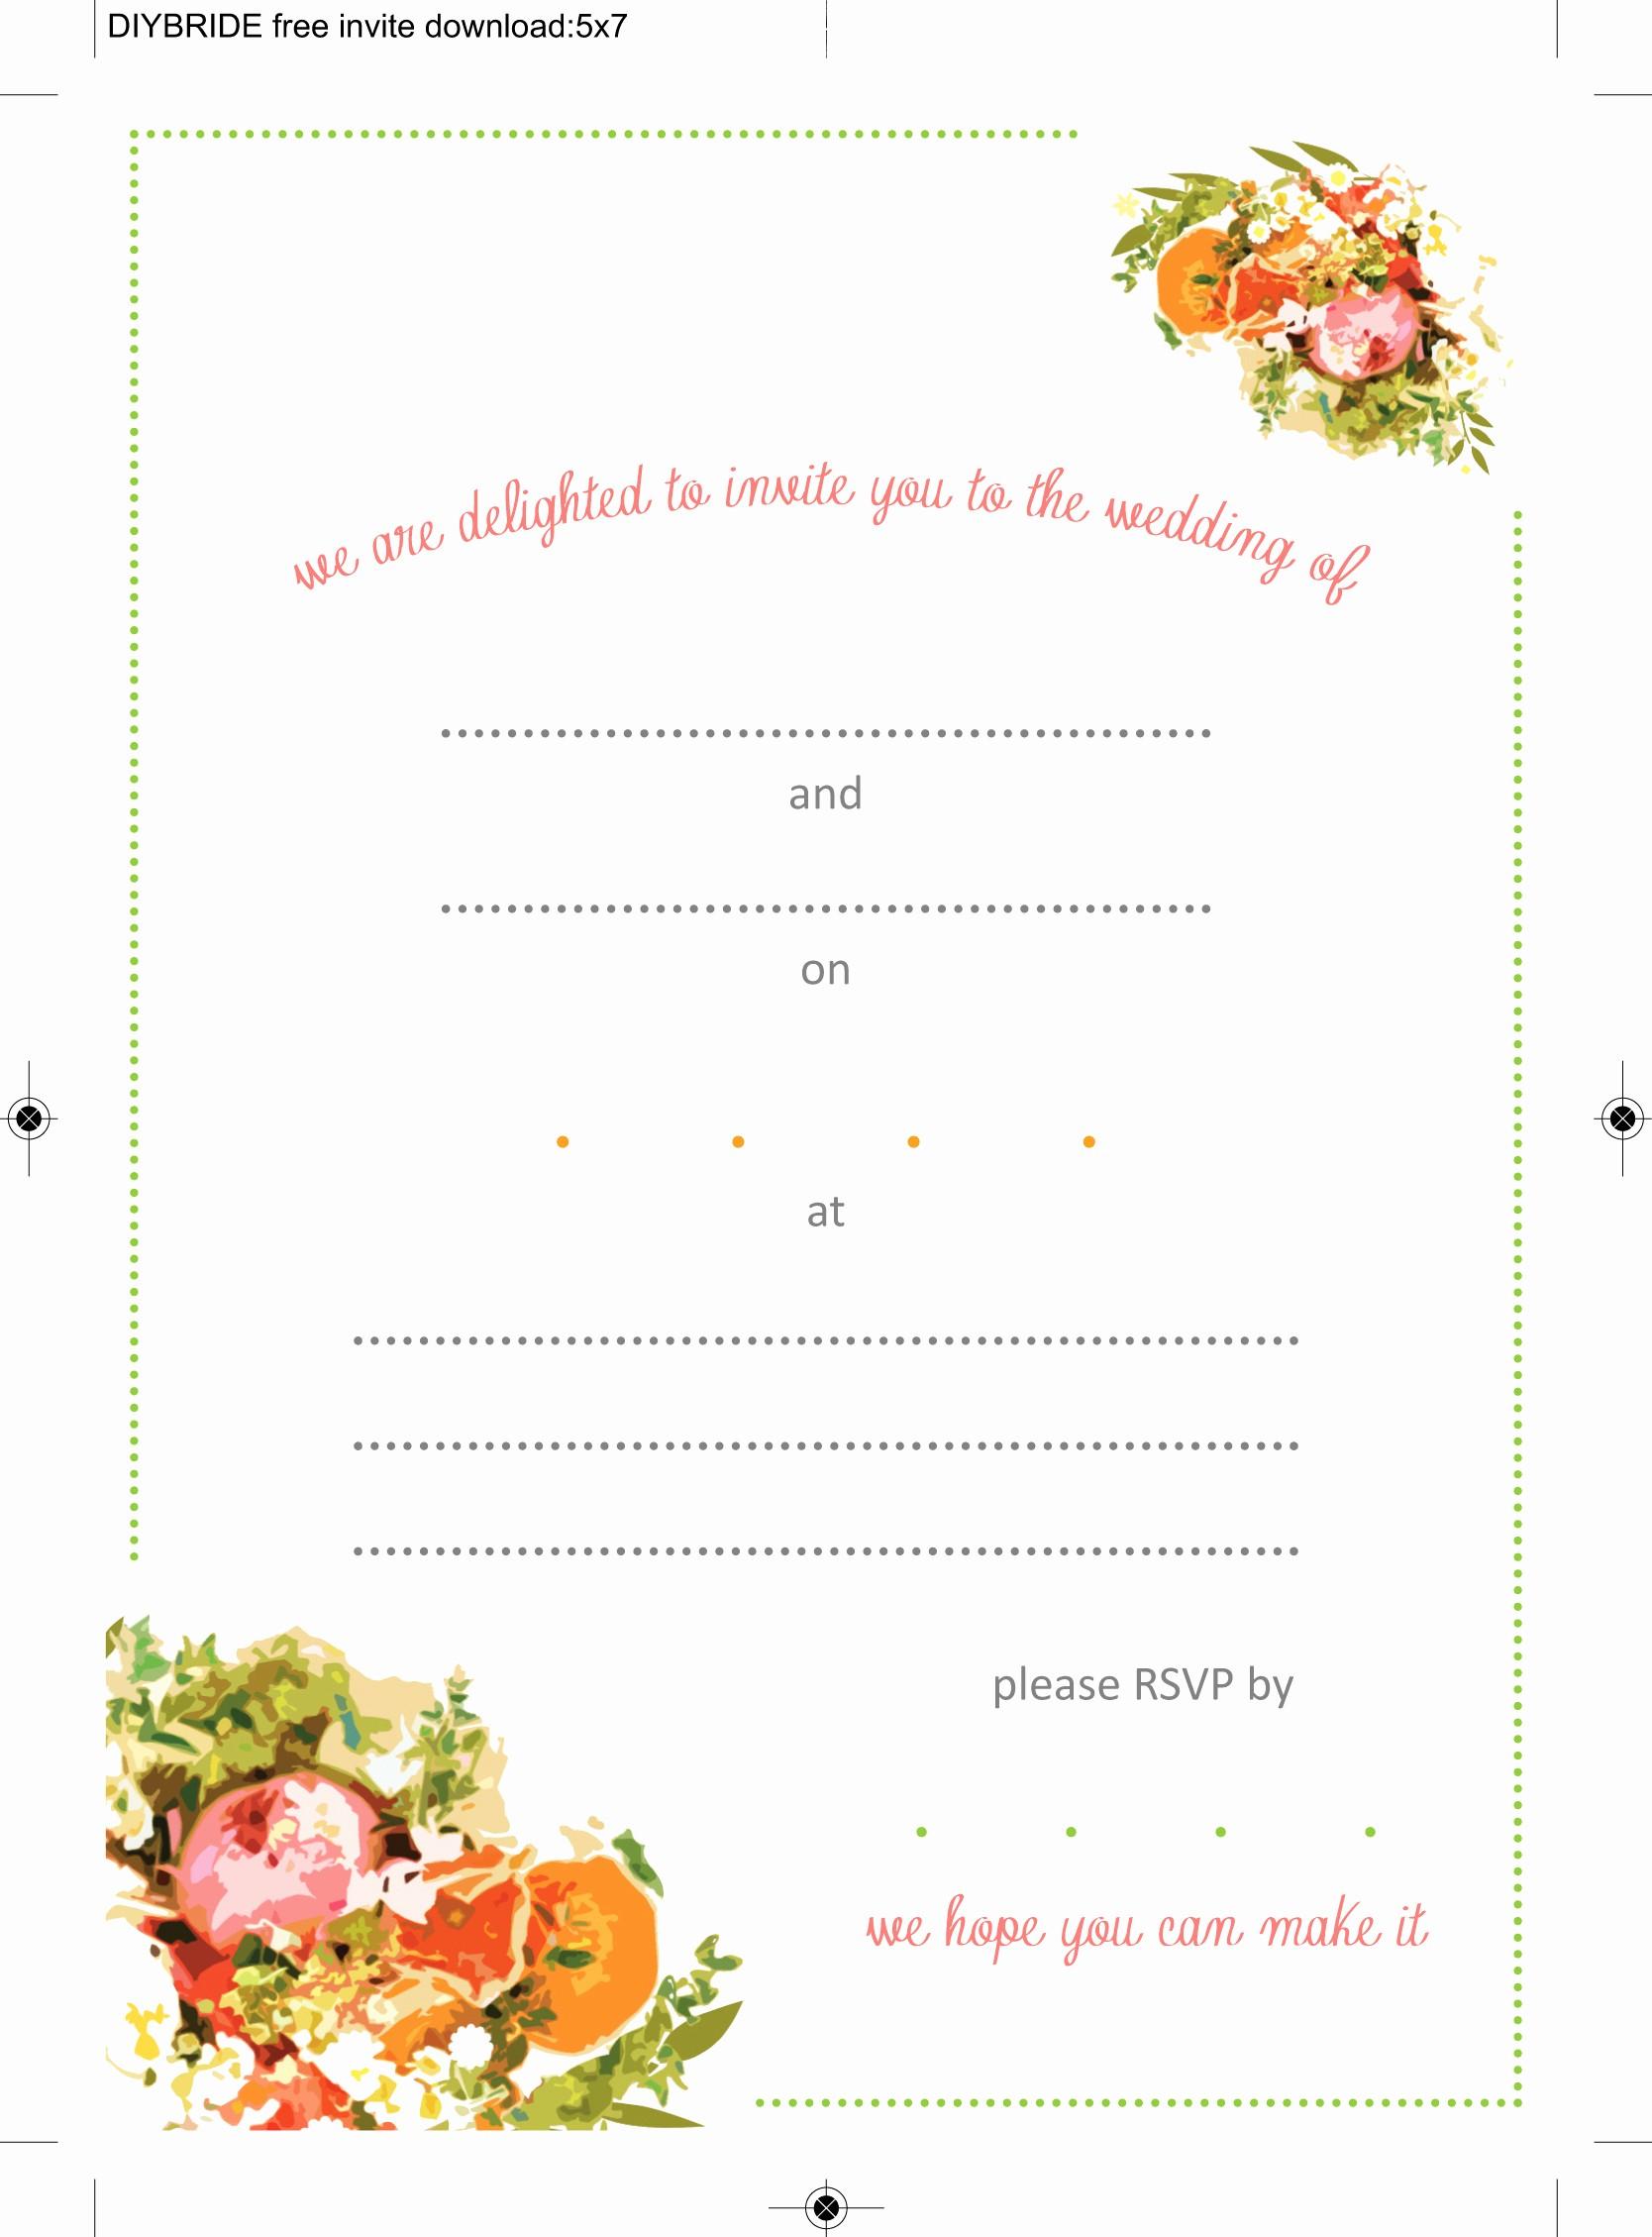 Wedding Invitation Template Word Free Fresh Wedding Invitation Templates that are Cute and Easy to